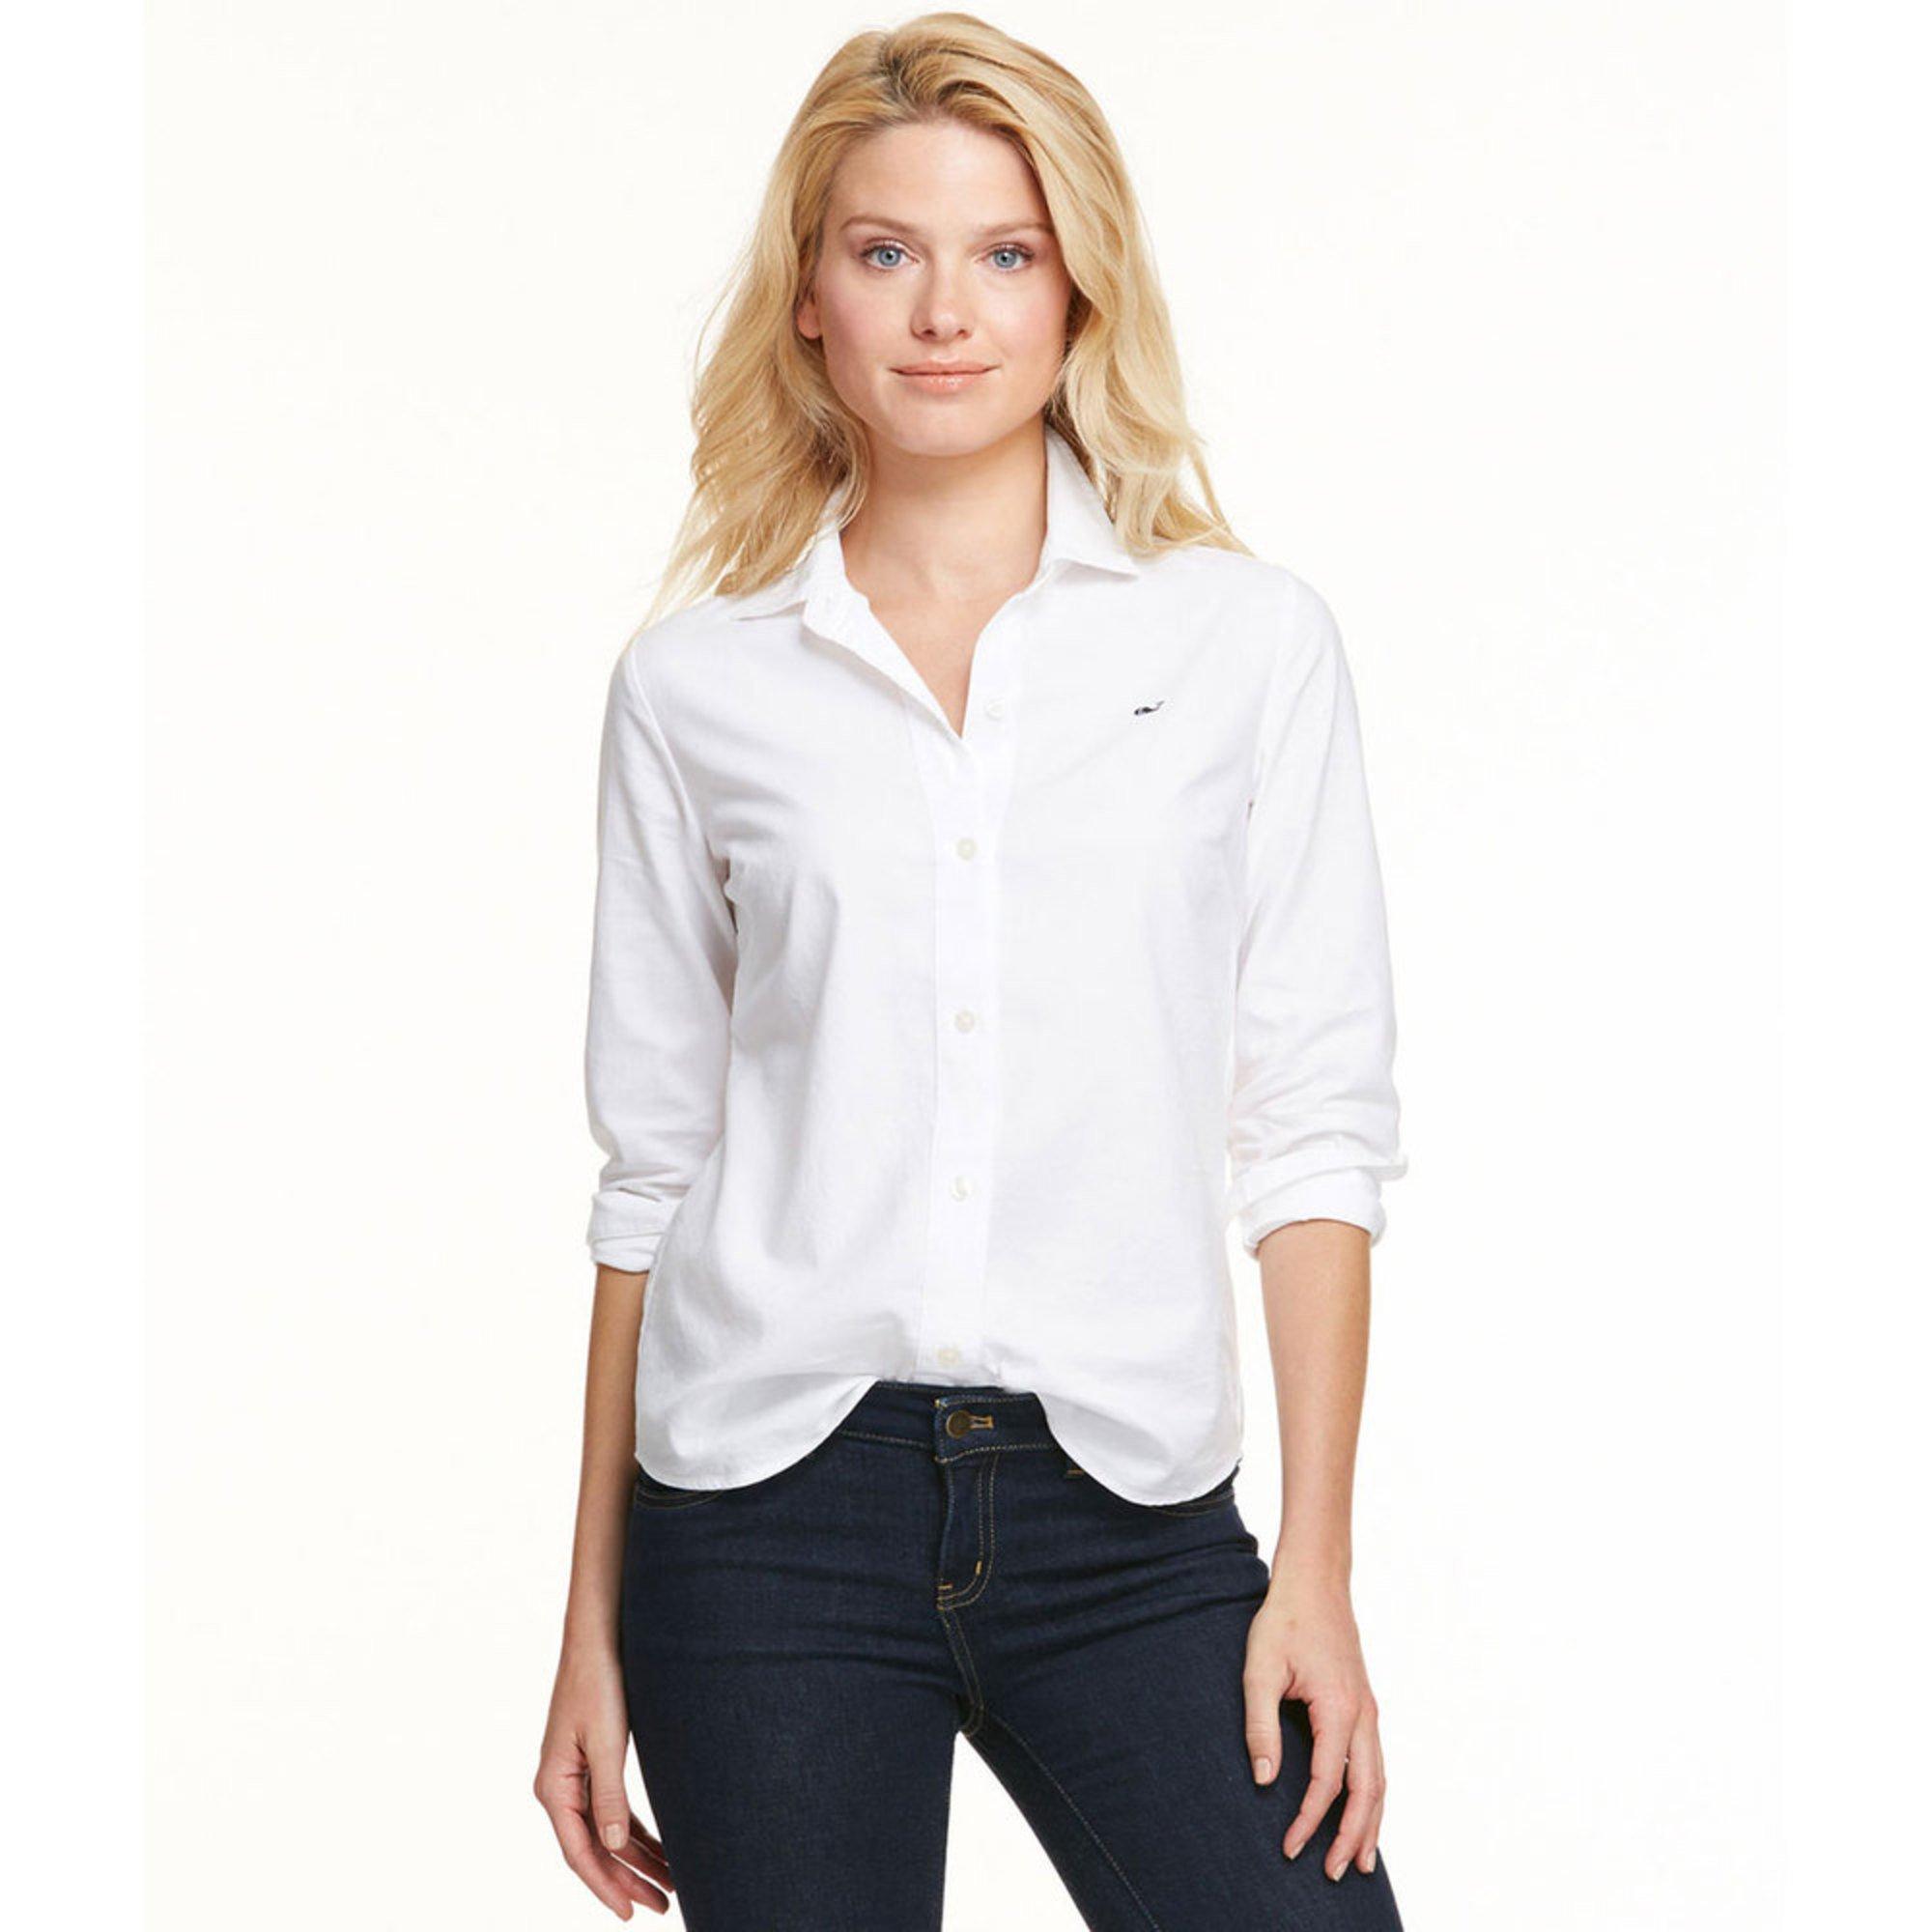 Vineyard Vines Oxford Shirt In White Women Apparel